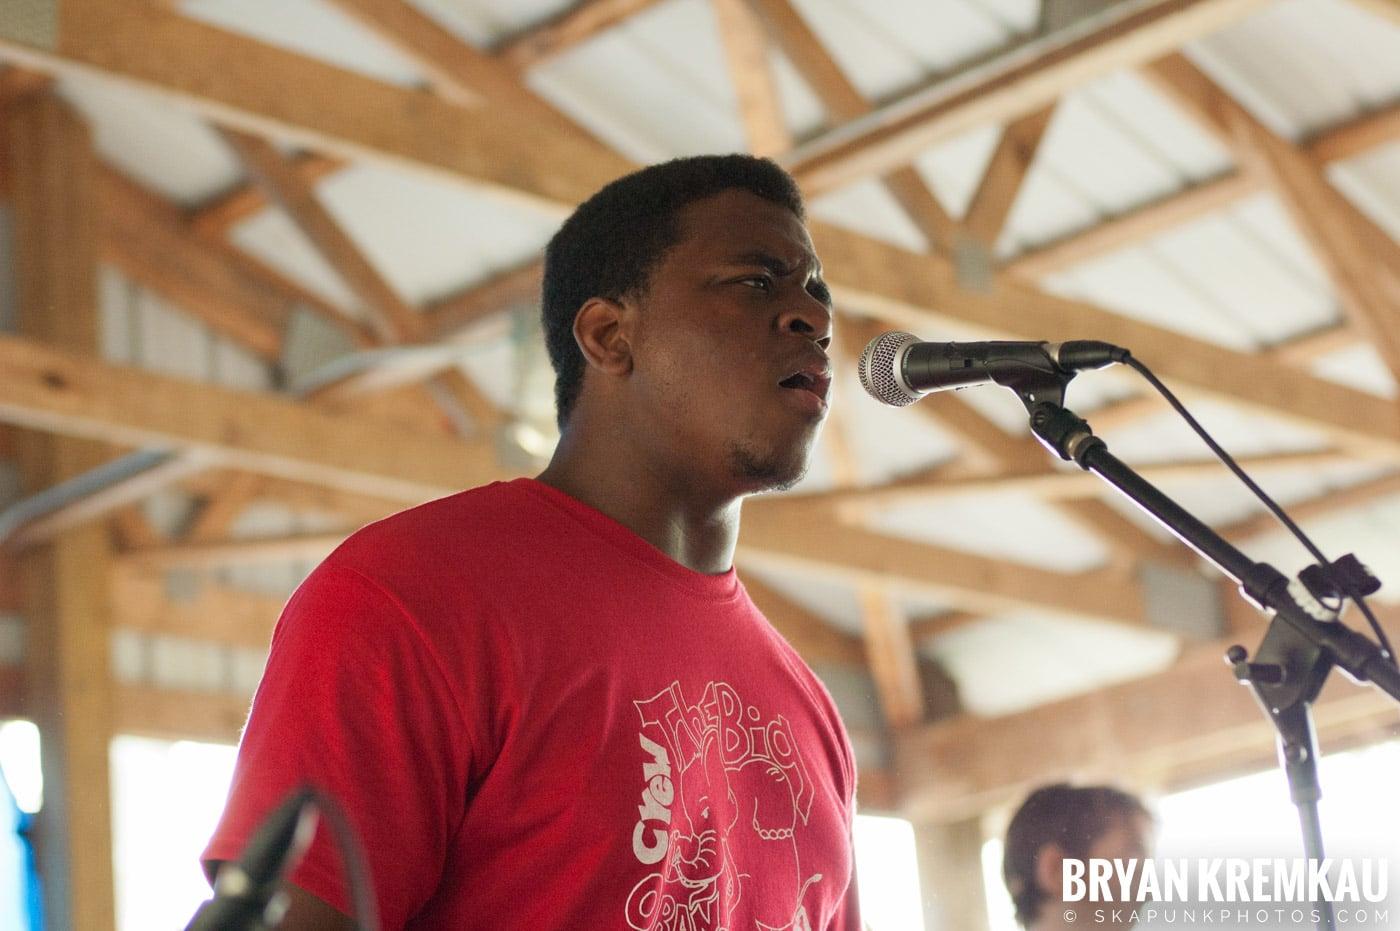 The Wendels @ The Big Orange Bonanza, Circleville, NY - 6.2.07 (5)